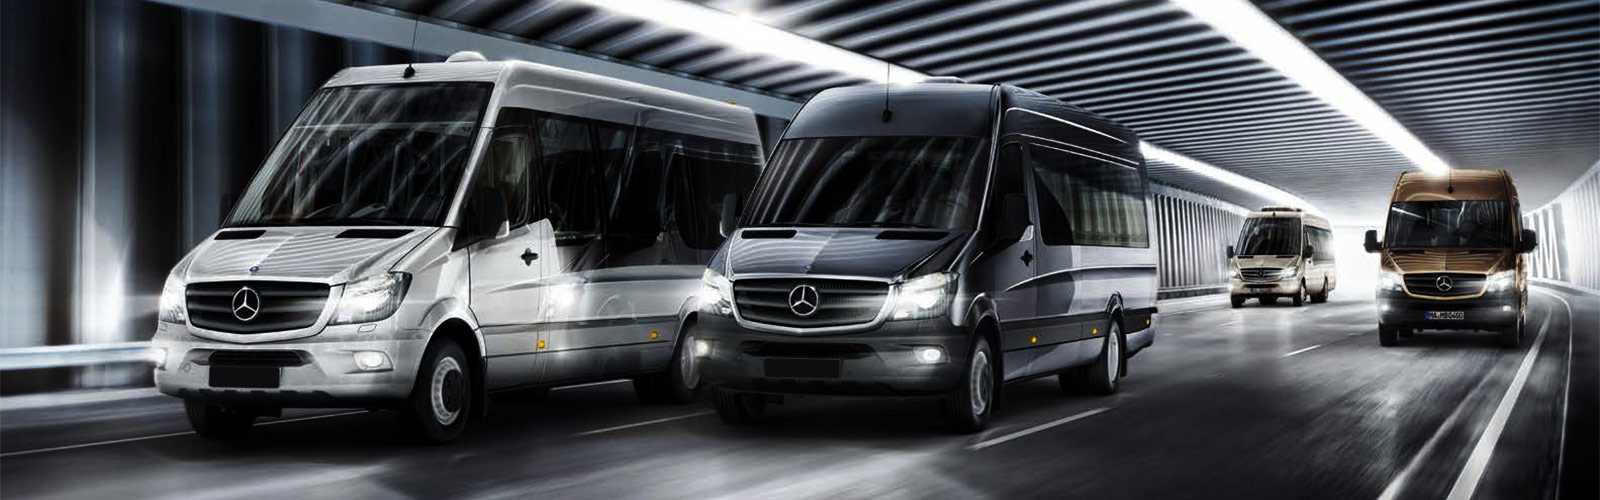 Preprava osôb minibusom